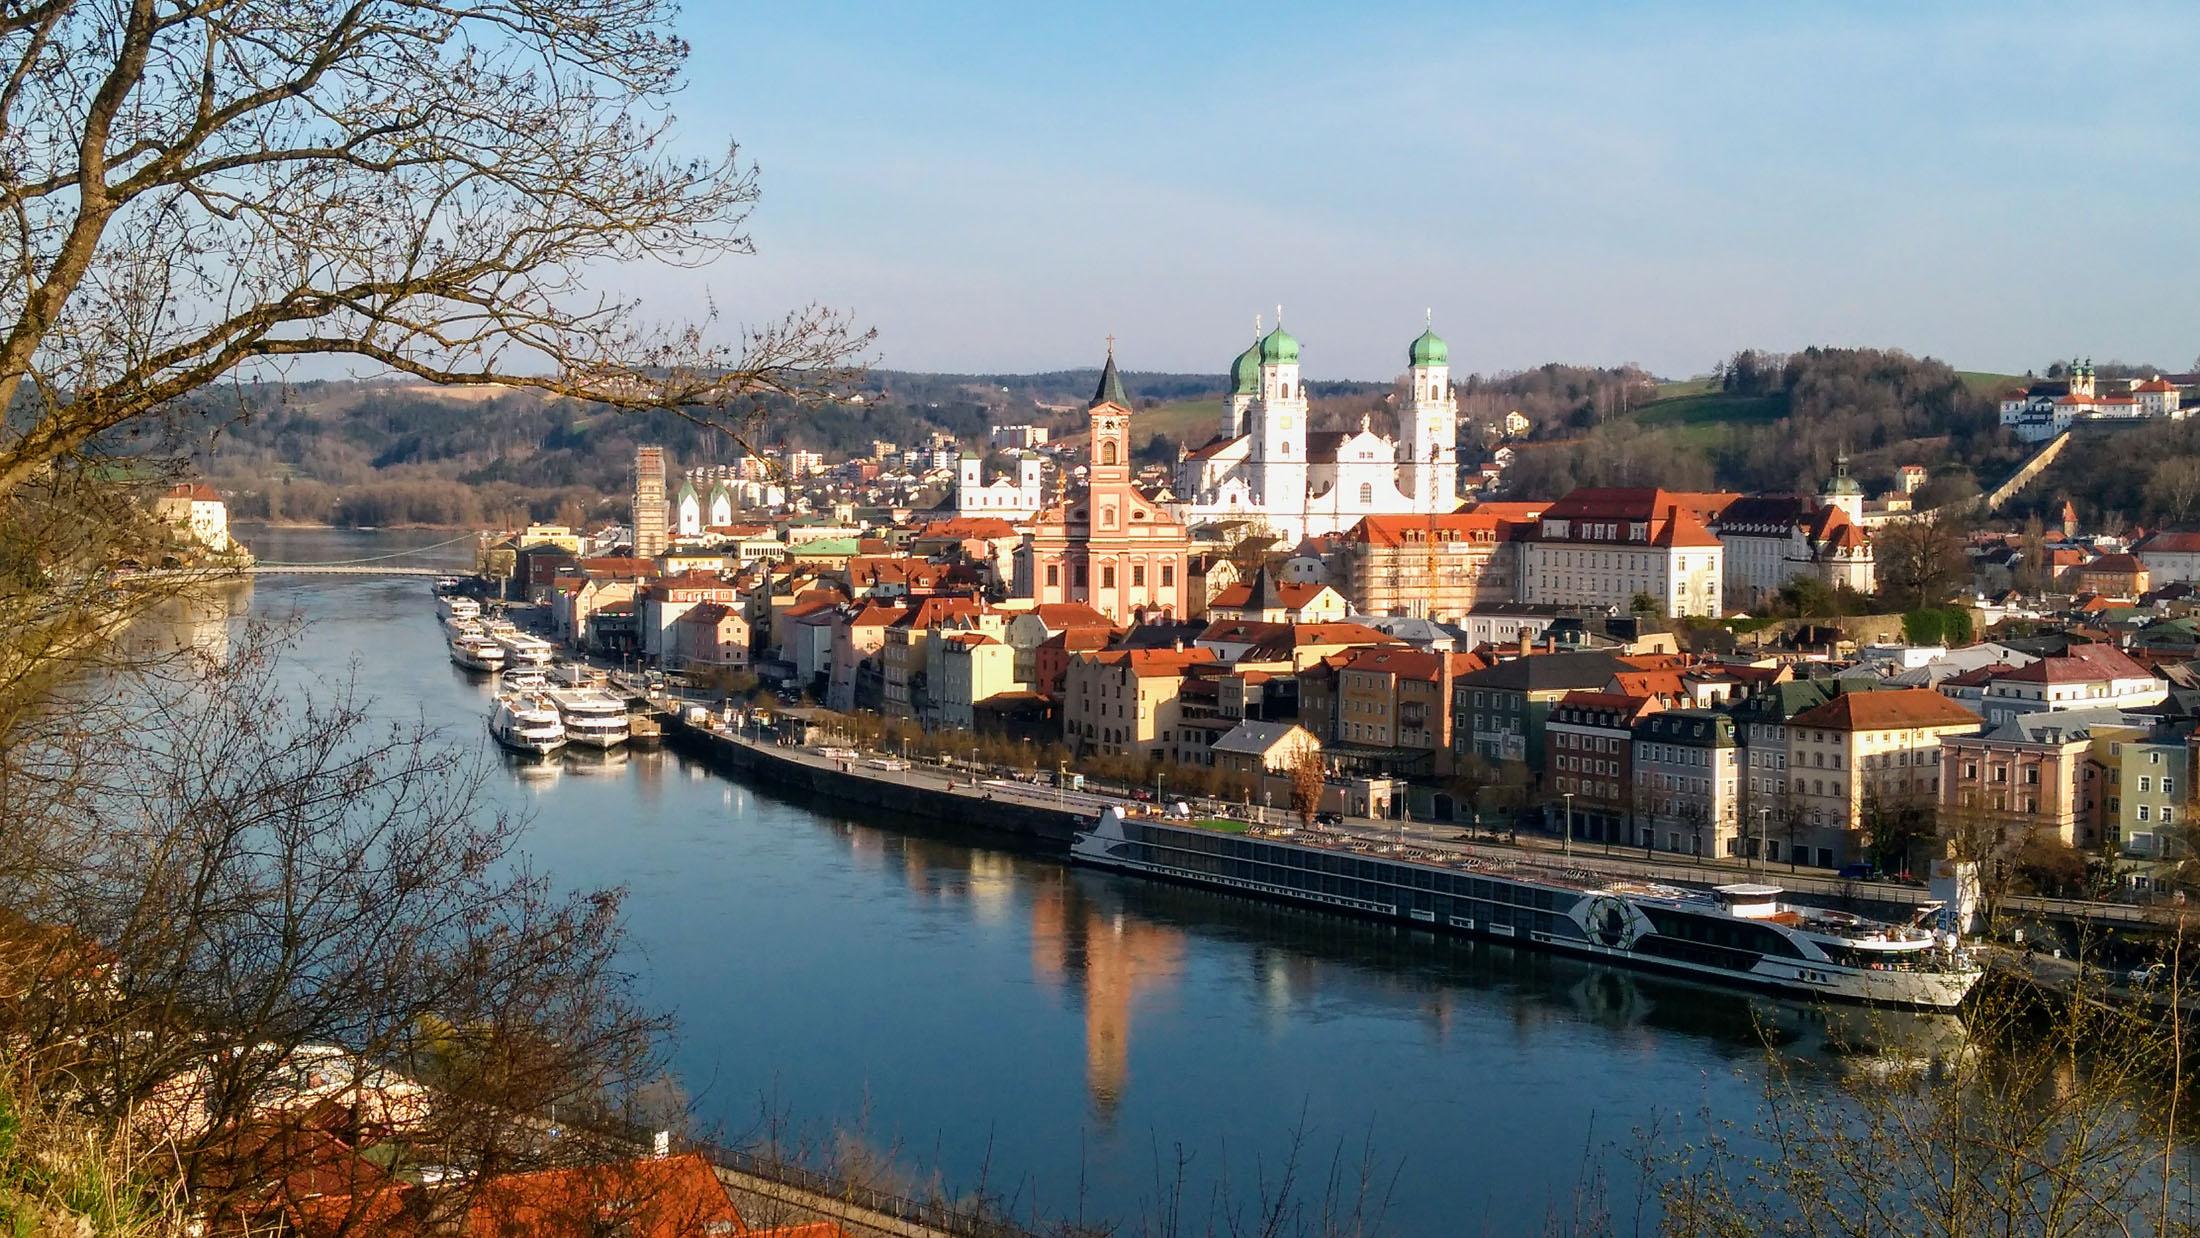 Passau the city on three rivers